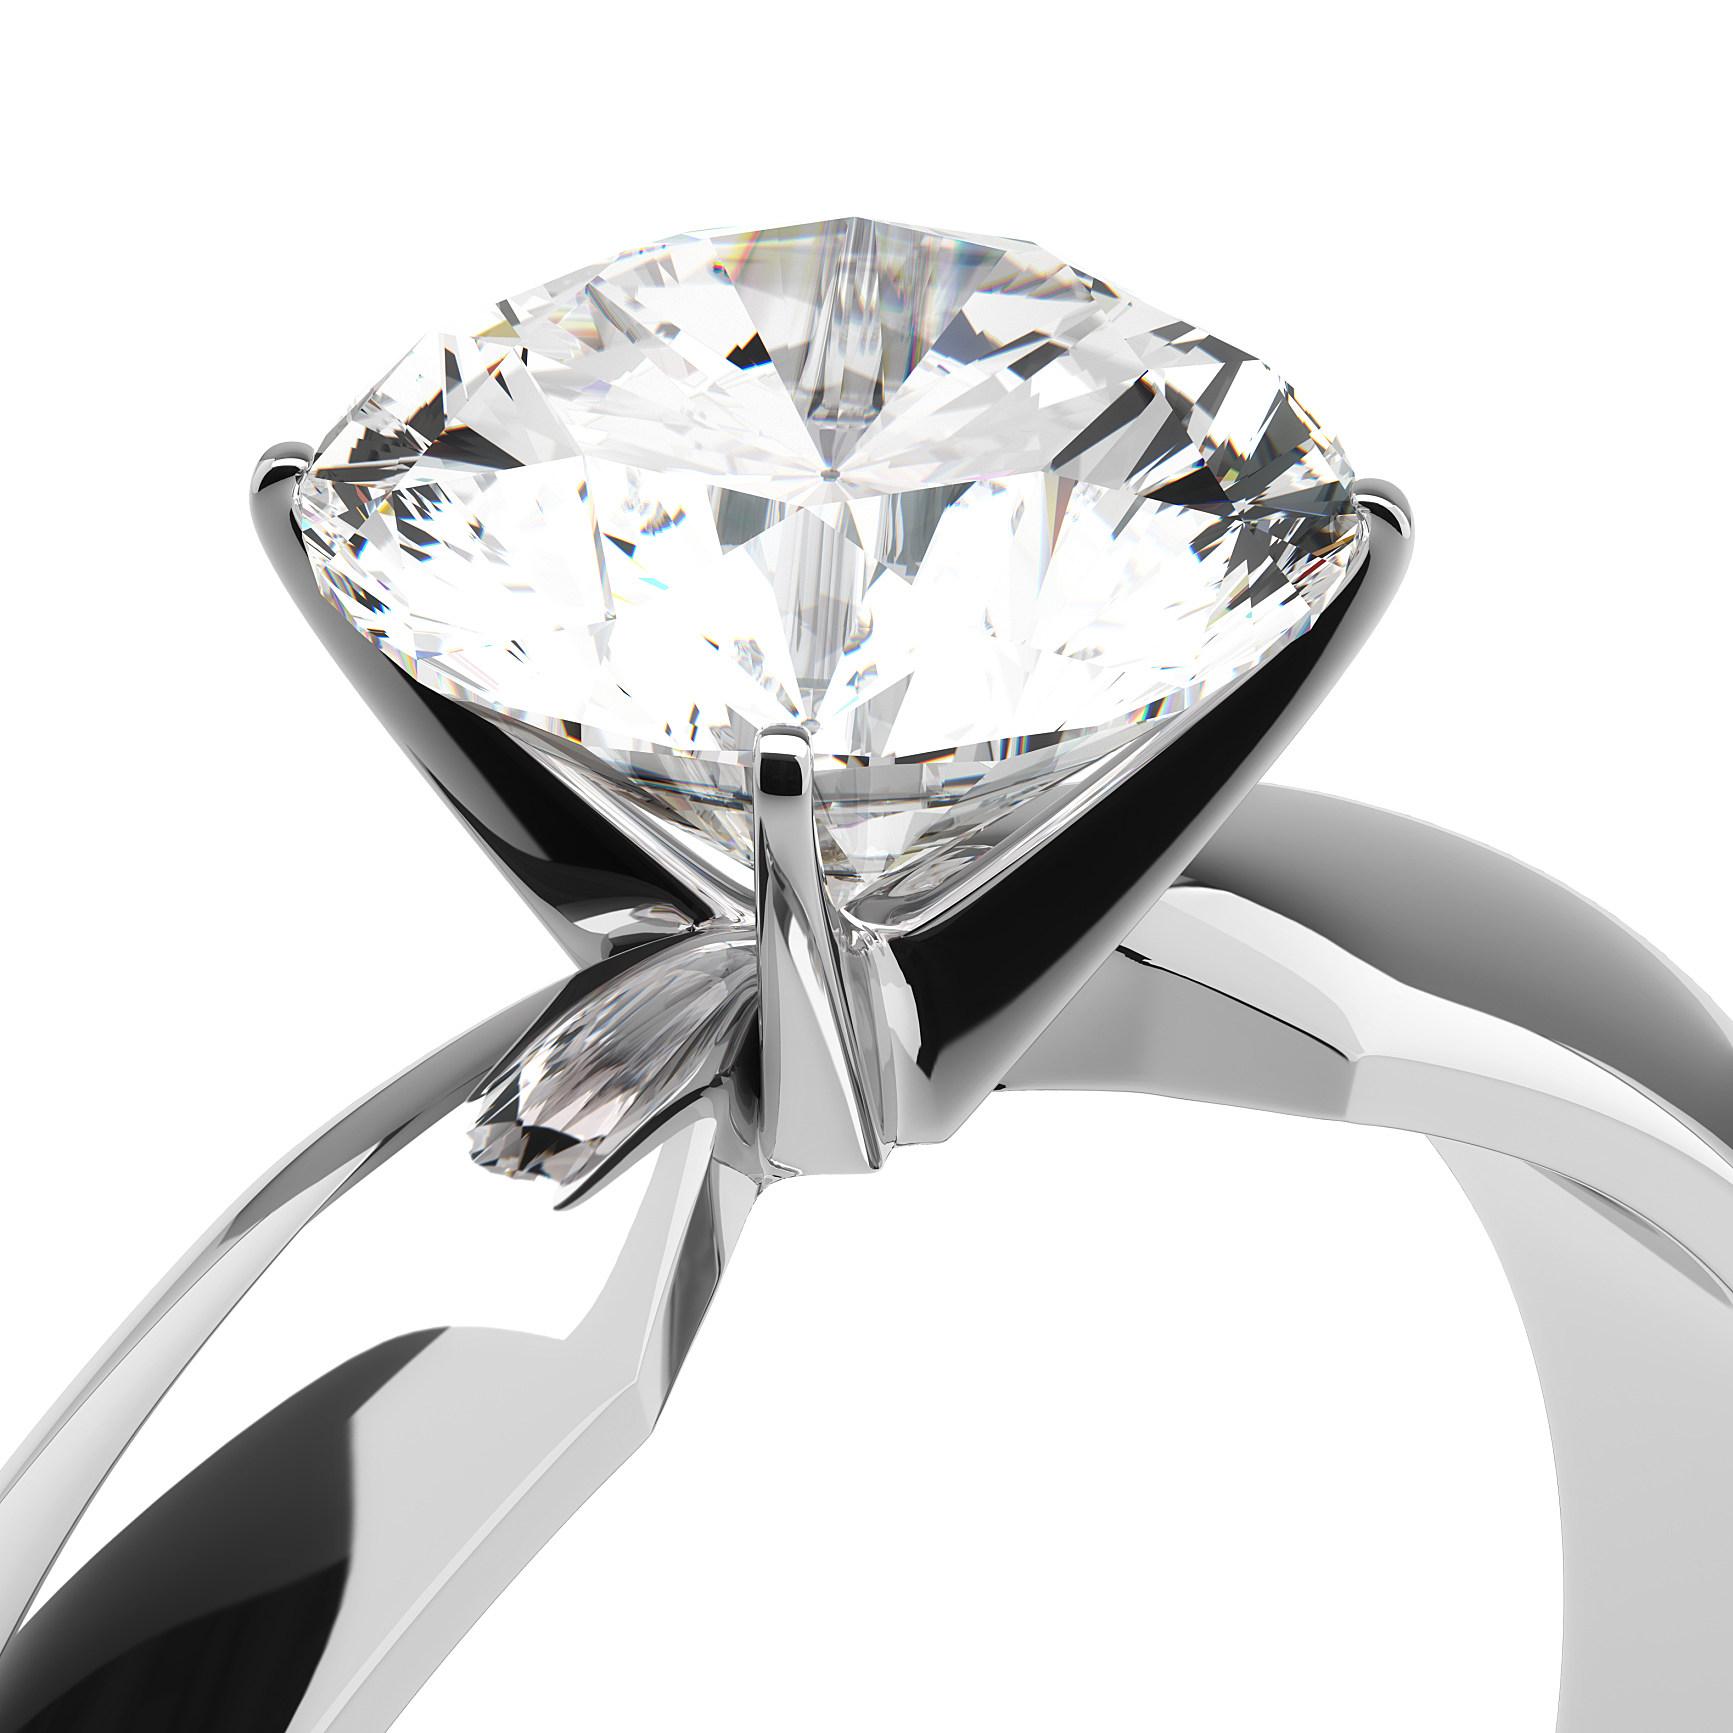 Enter to Win the Krukemeyer Cohn Diamond in the Rough Contest